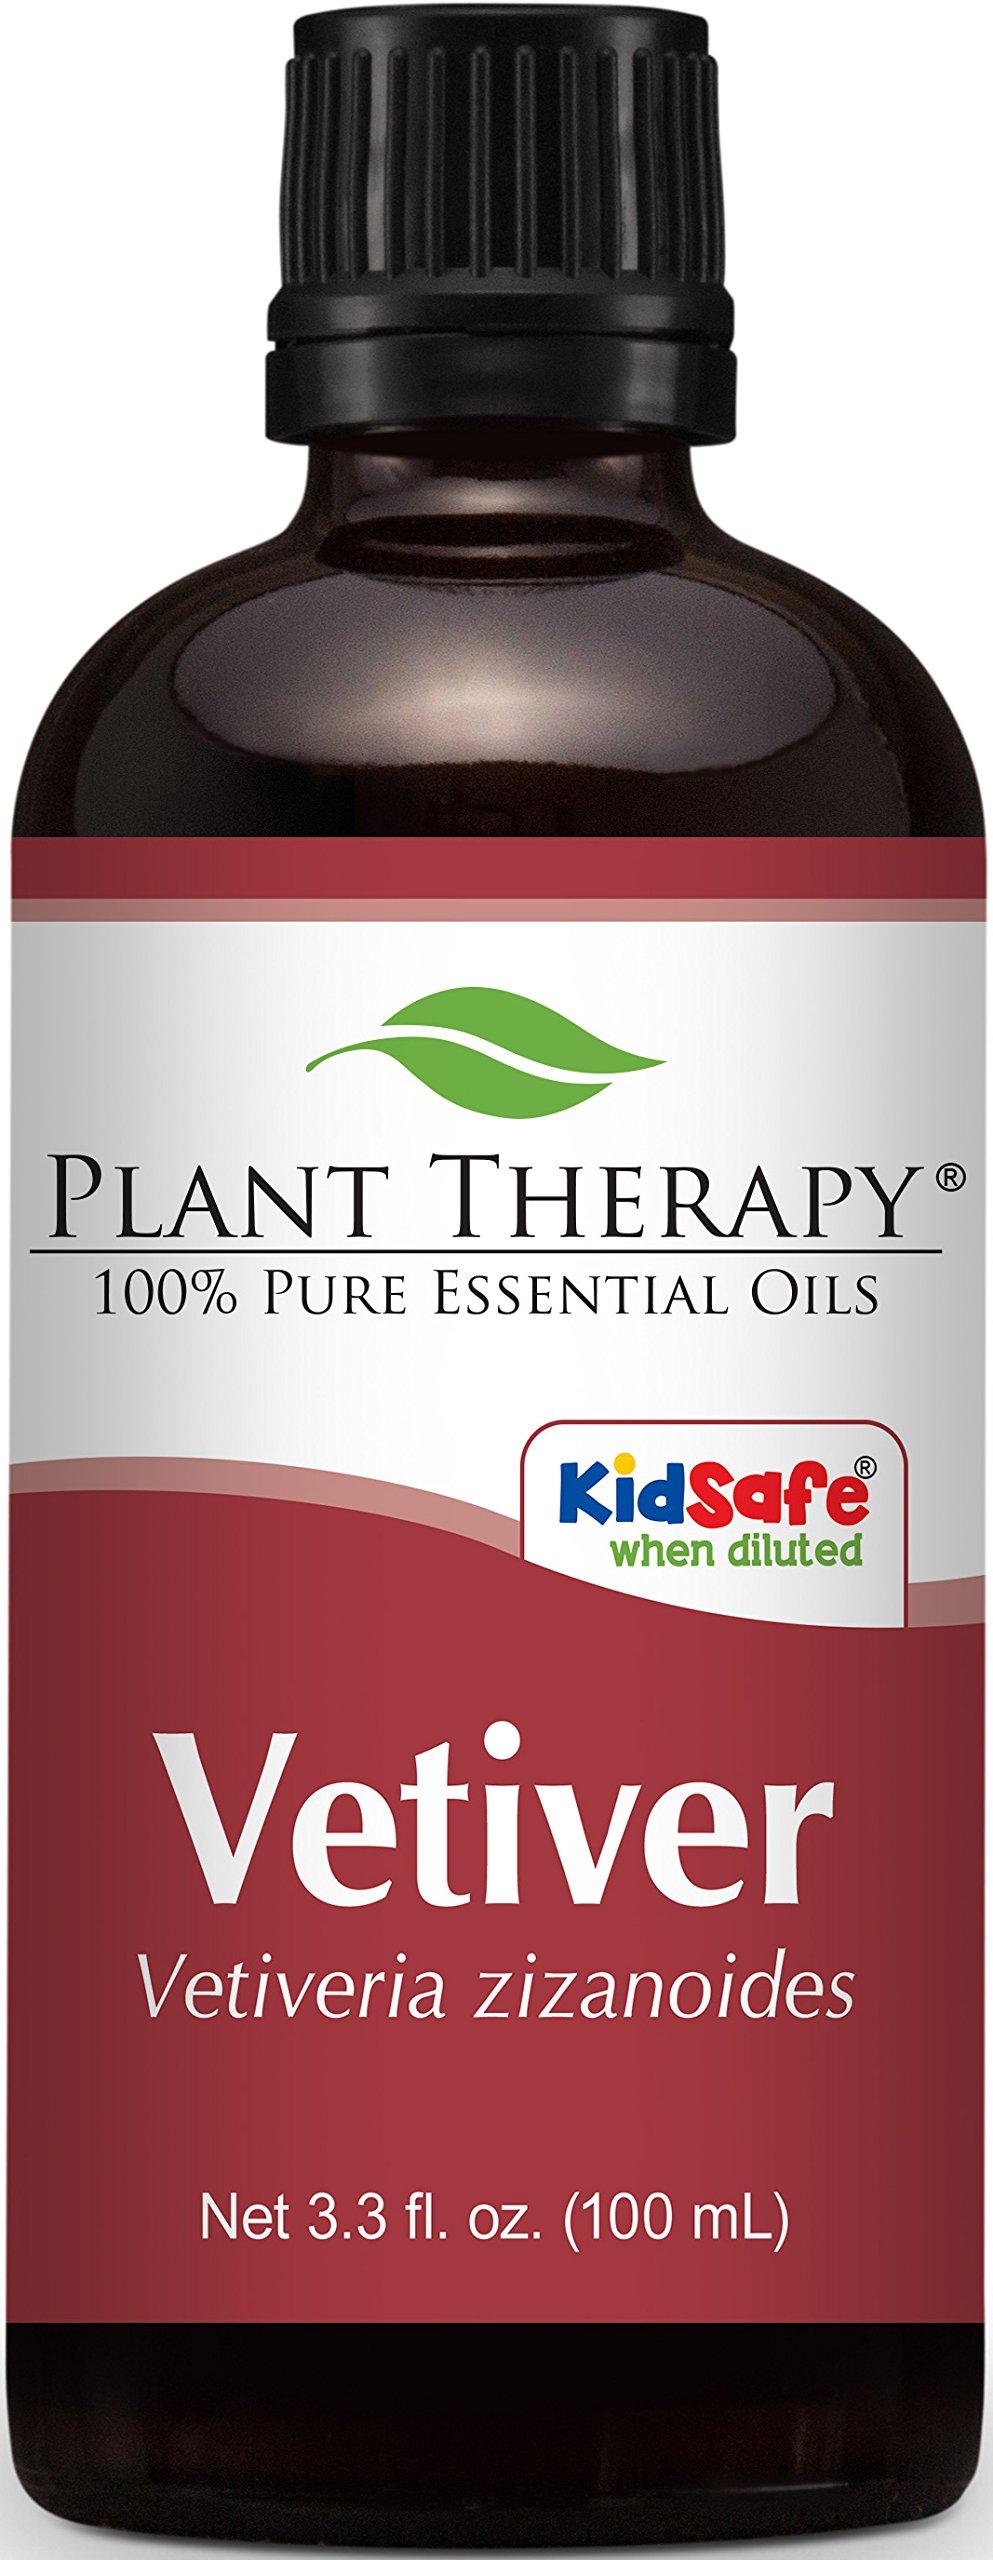 Plant Therapy Vetiver Essential Oil 100 mL (3.3 oz) 100% Pure, Undiluted, Therapeutic Grade